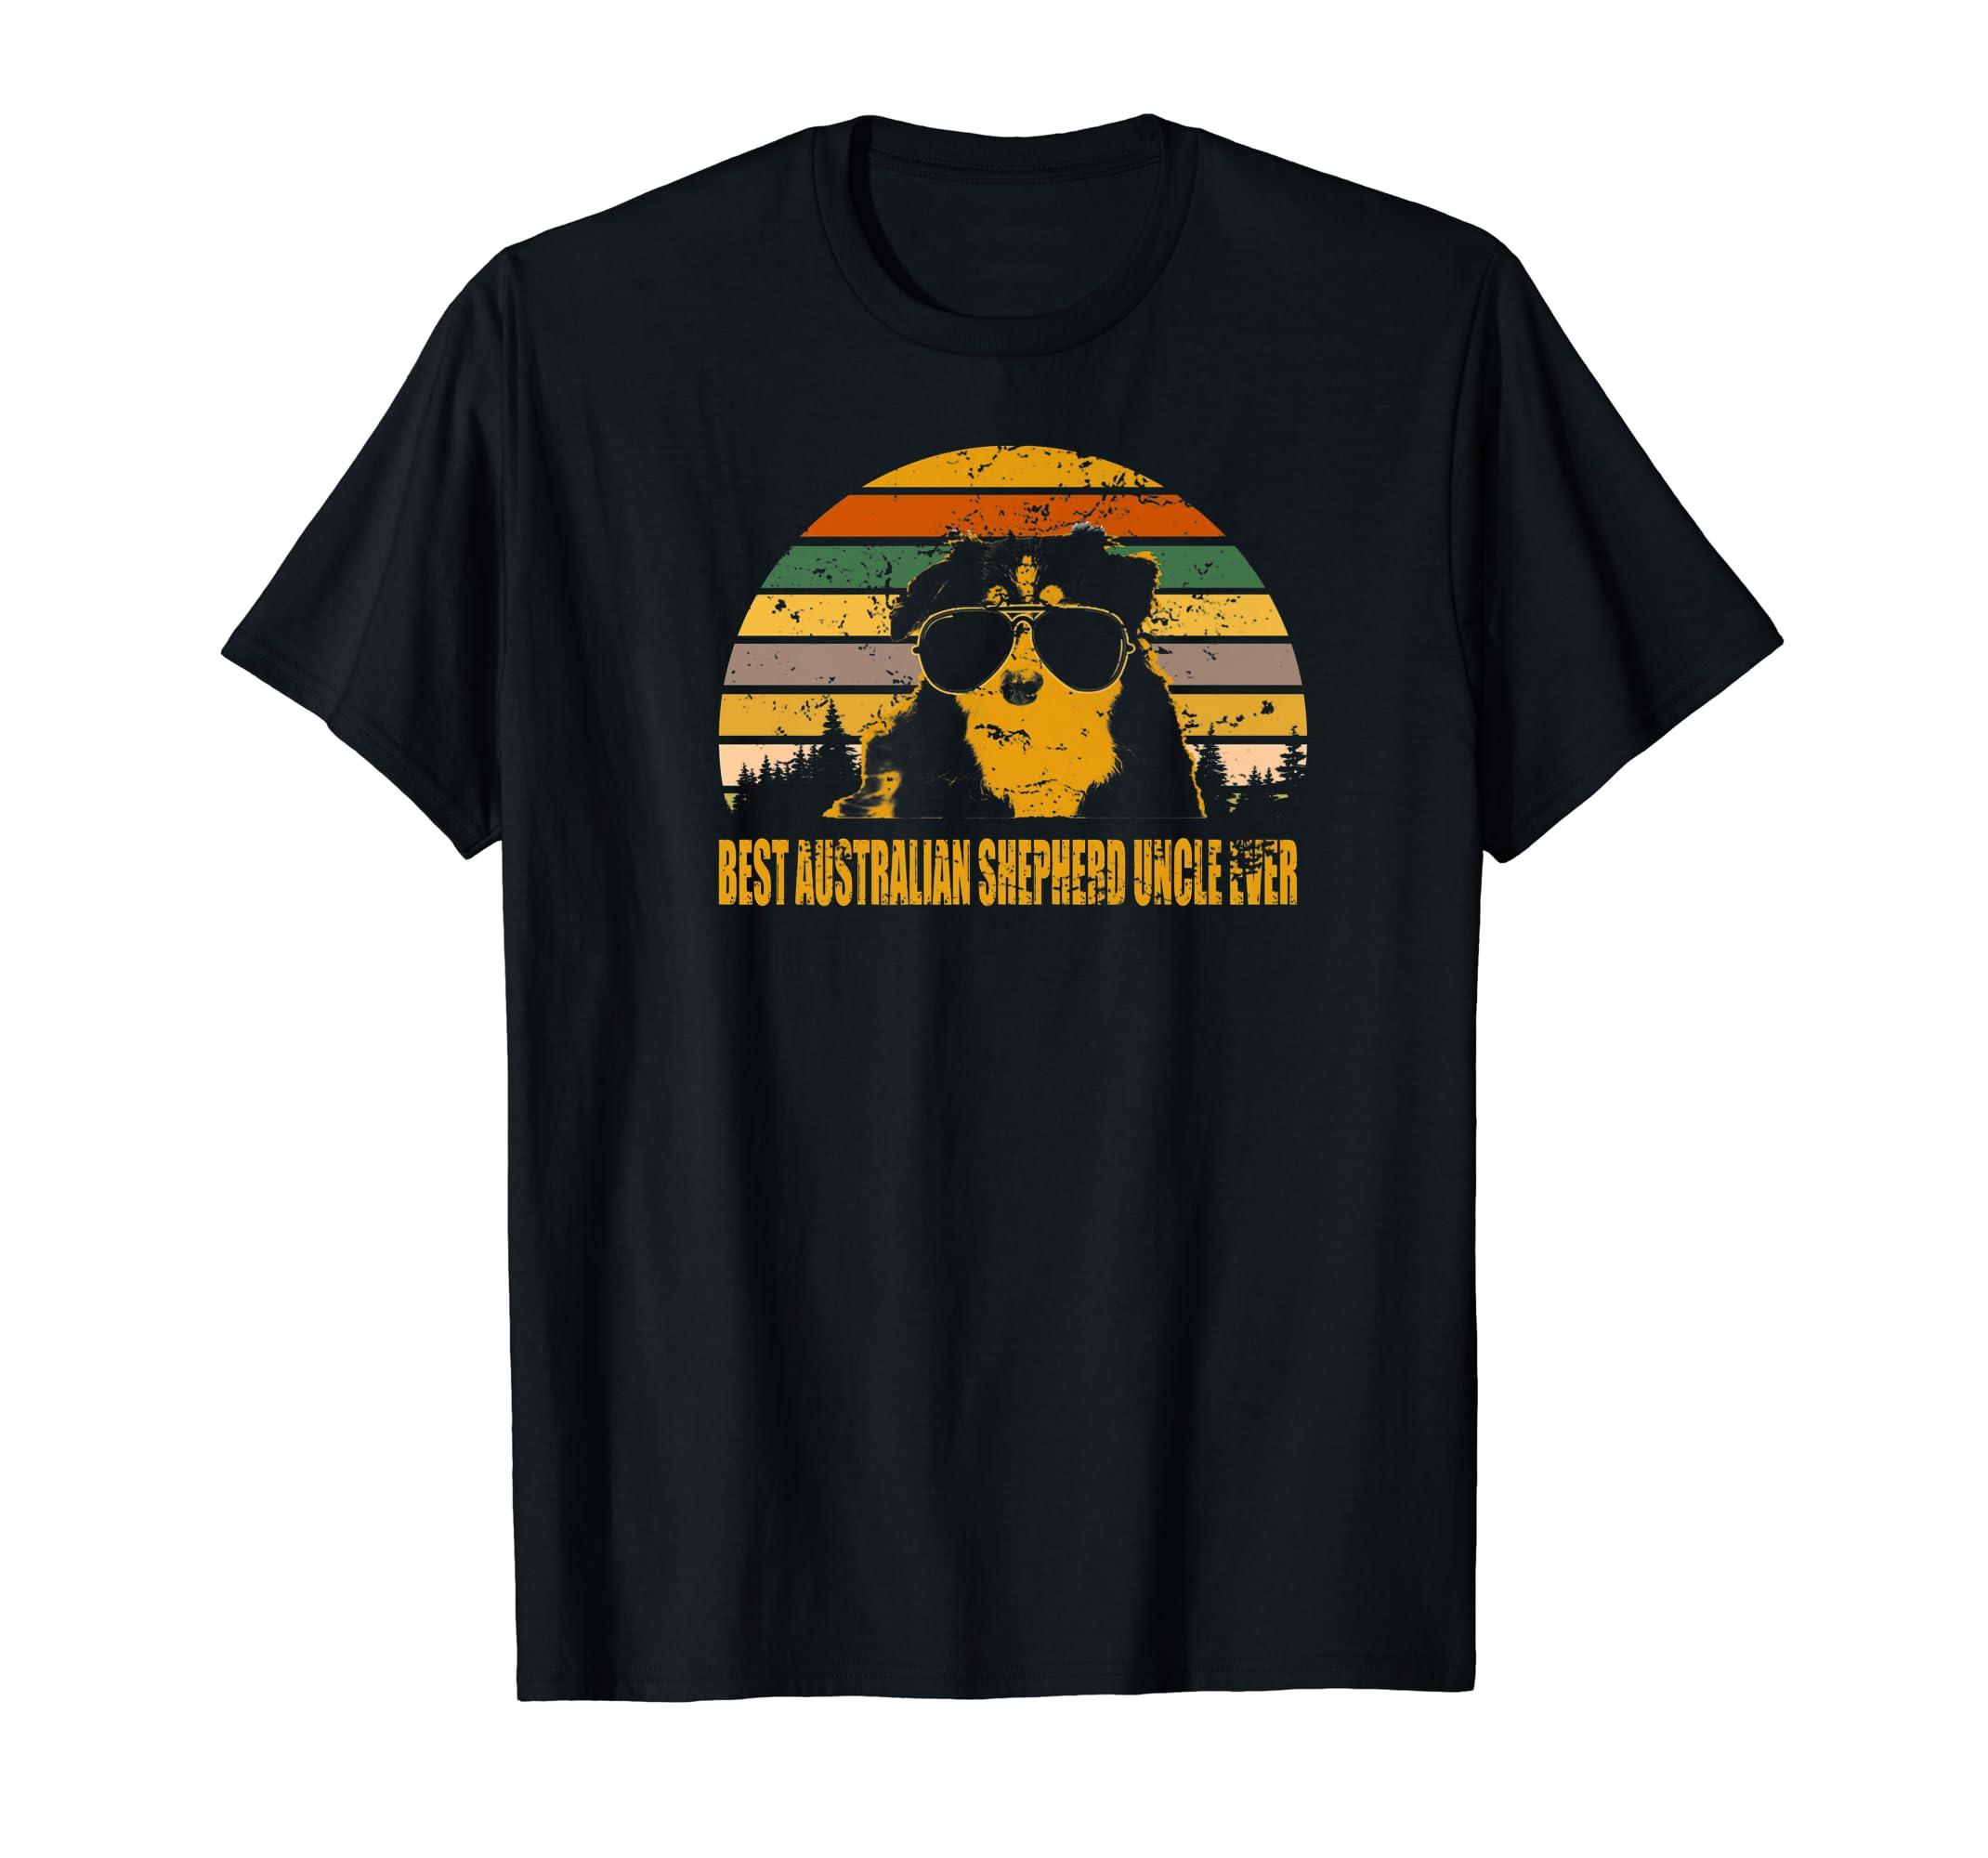 Australian Shepherd Best Australian Shepherd Uncle Ever  Premium T-Shirt-Men's T-Shirt-Black